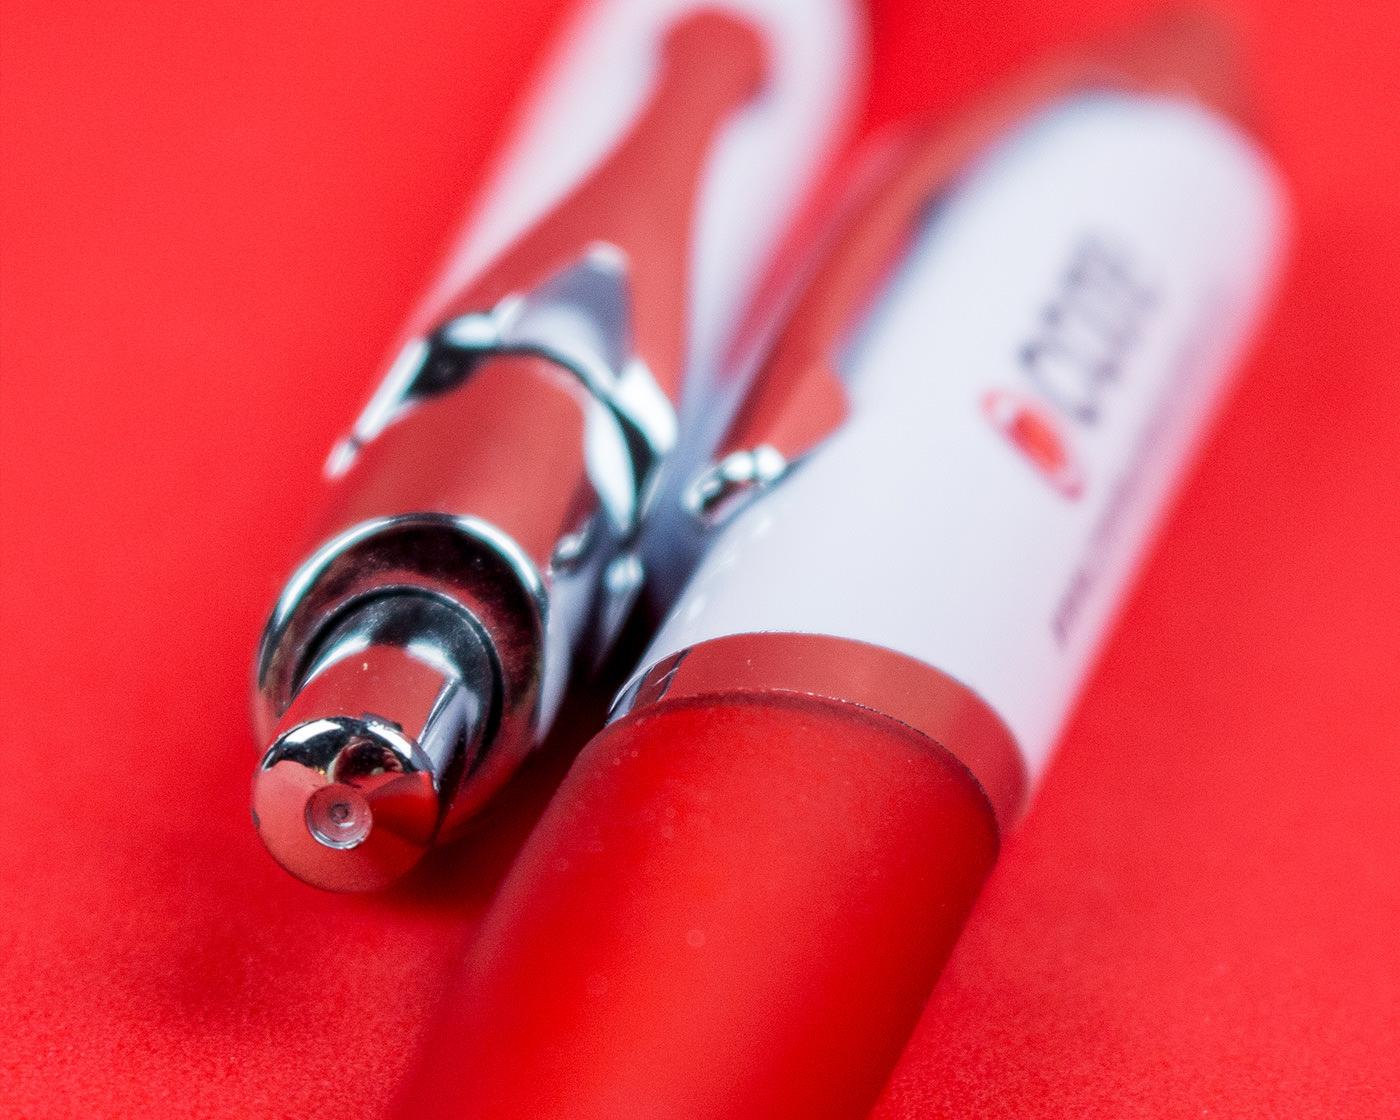 close-up-printed-pen